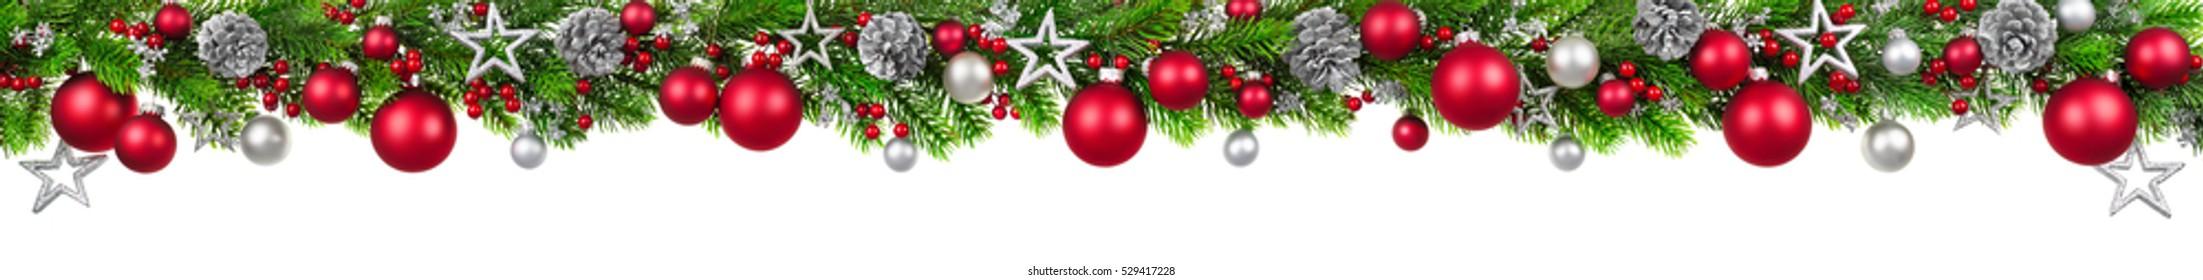 Christmas Border Images Stock Photos Vectors Shutterstock